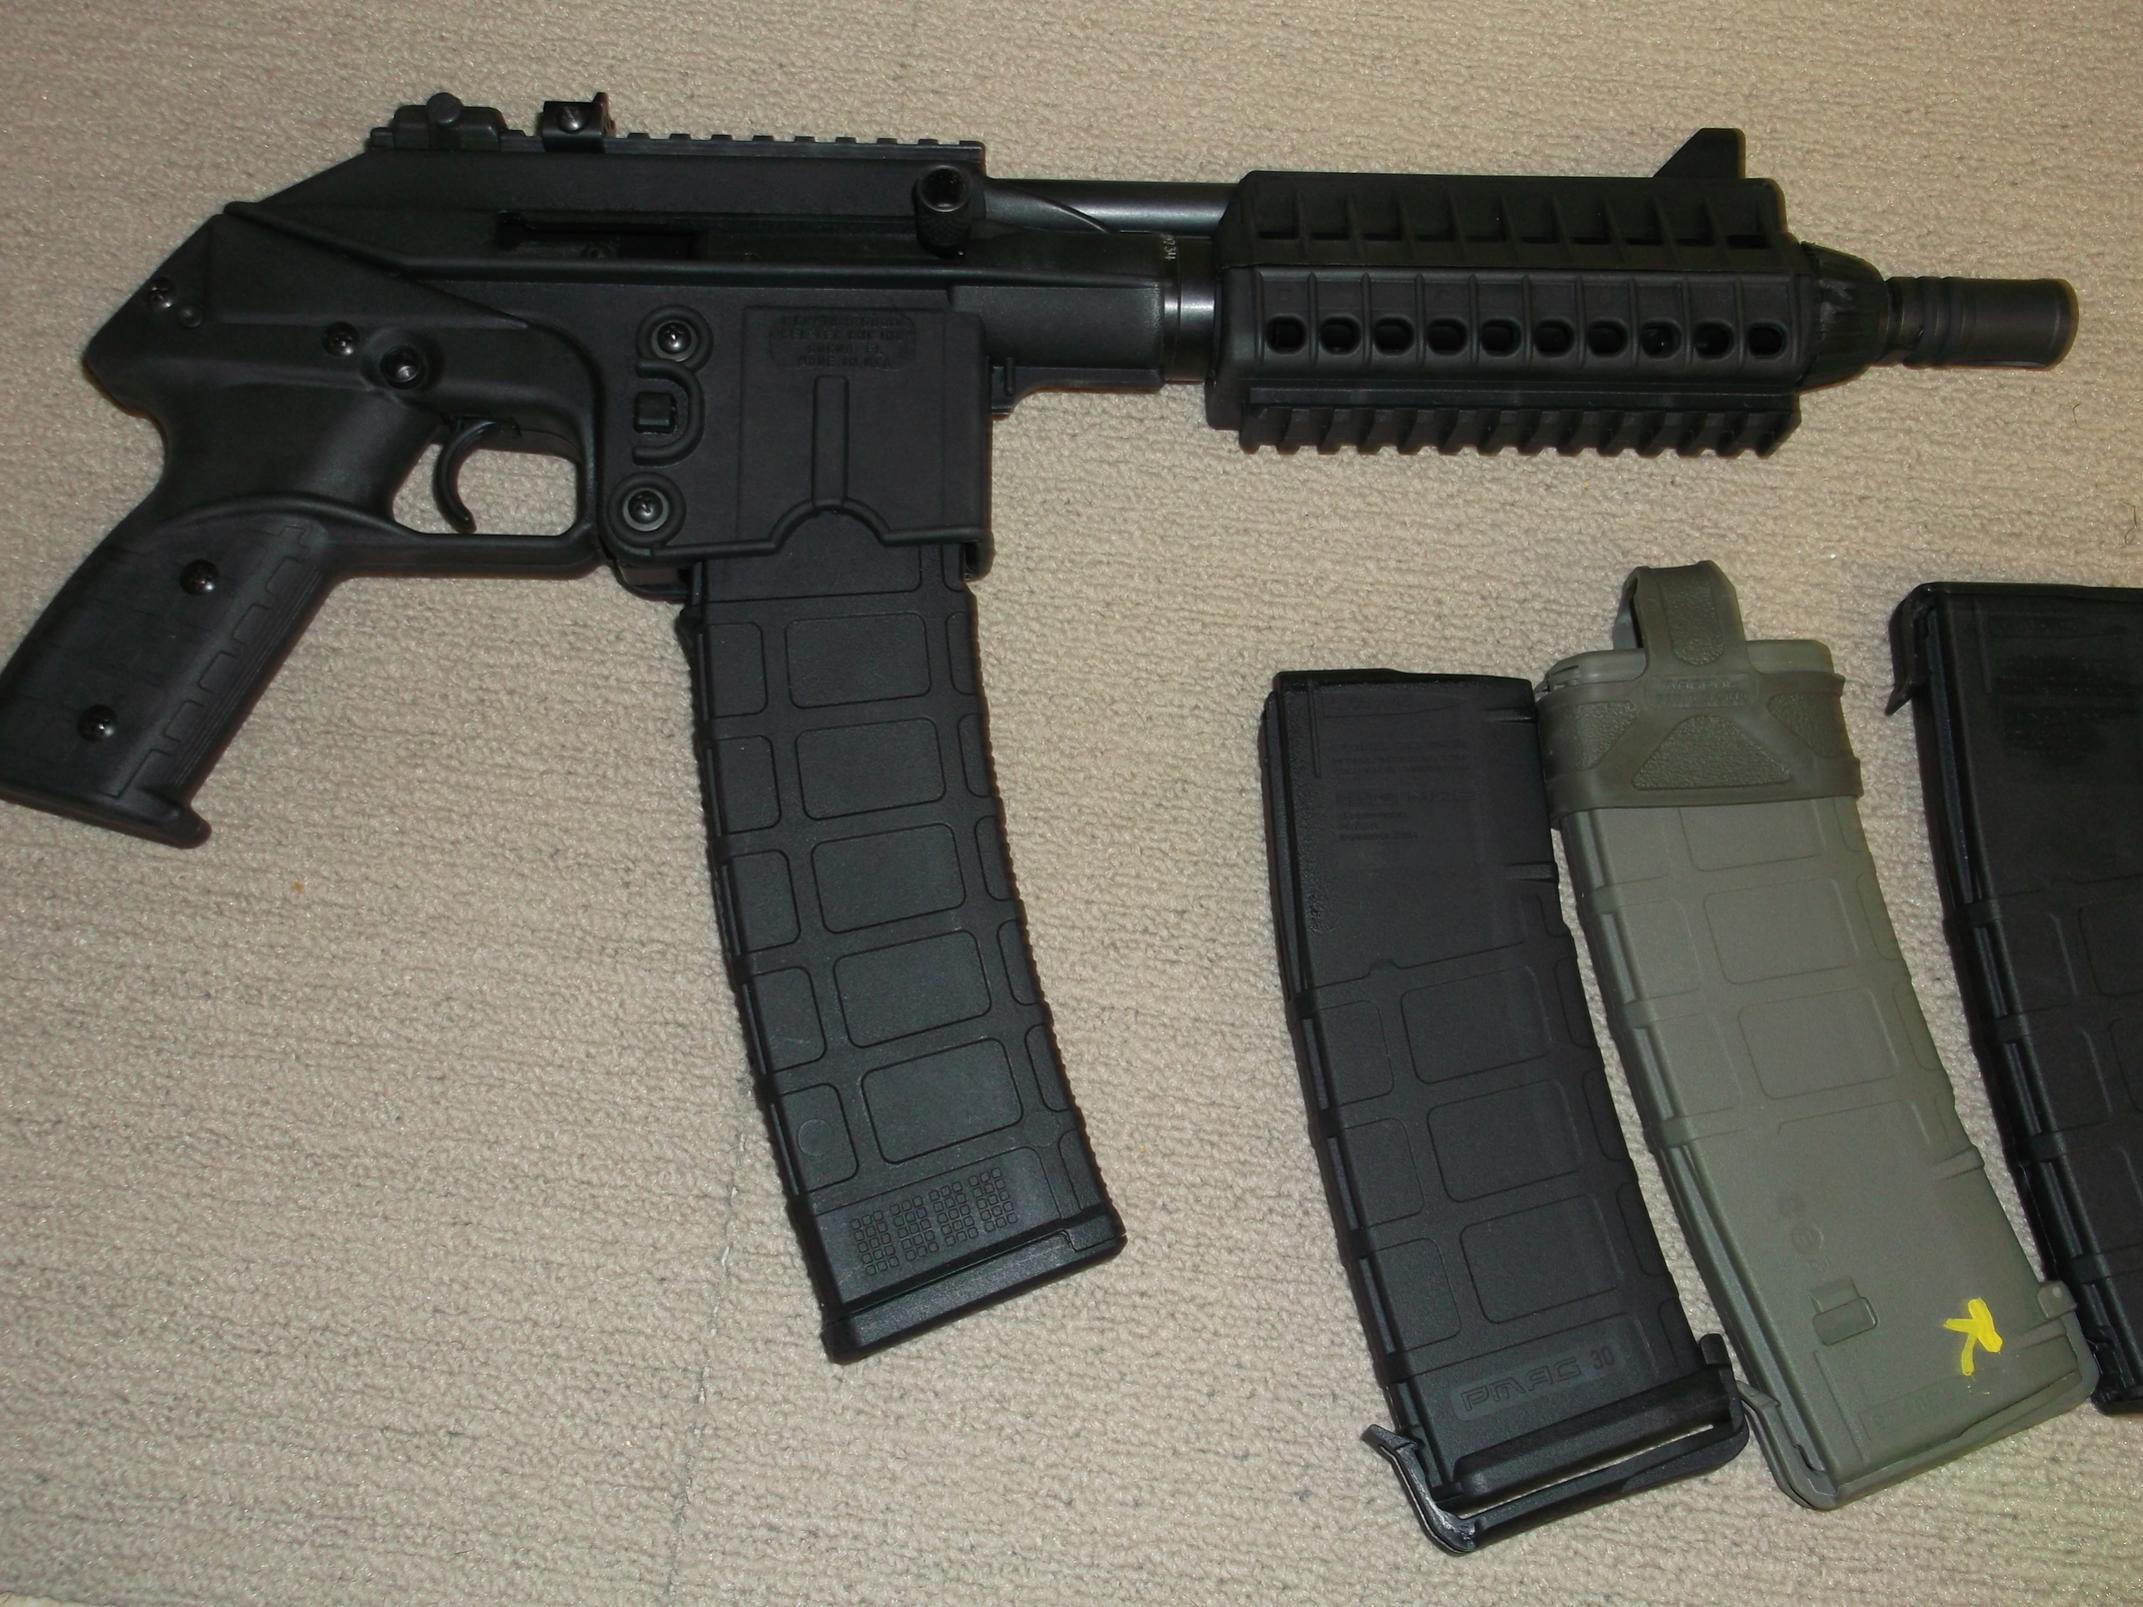 Possible to build AR pistol for under 0 ??????? >>>>>>>-plr16-5.56-40-rd-w-heatshield-sling-mags-semi-pistol.jpg